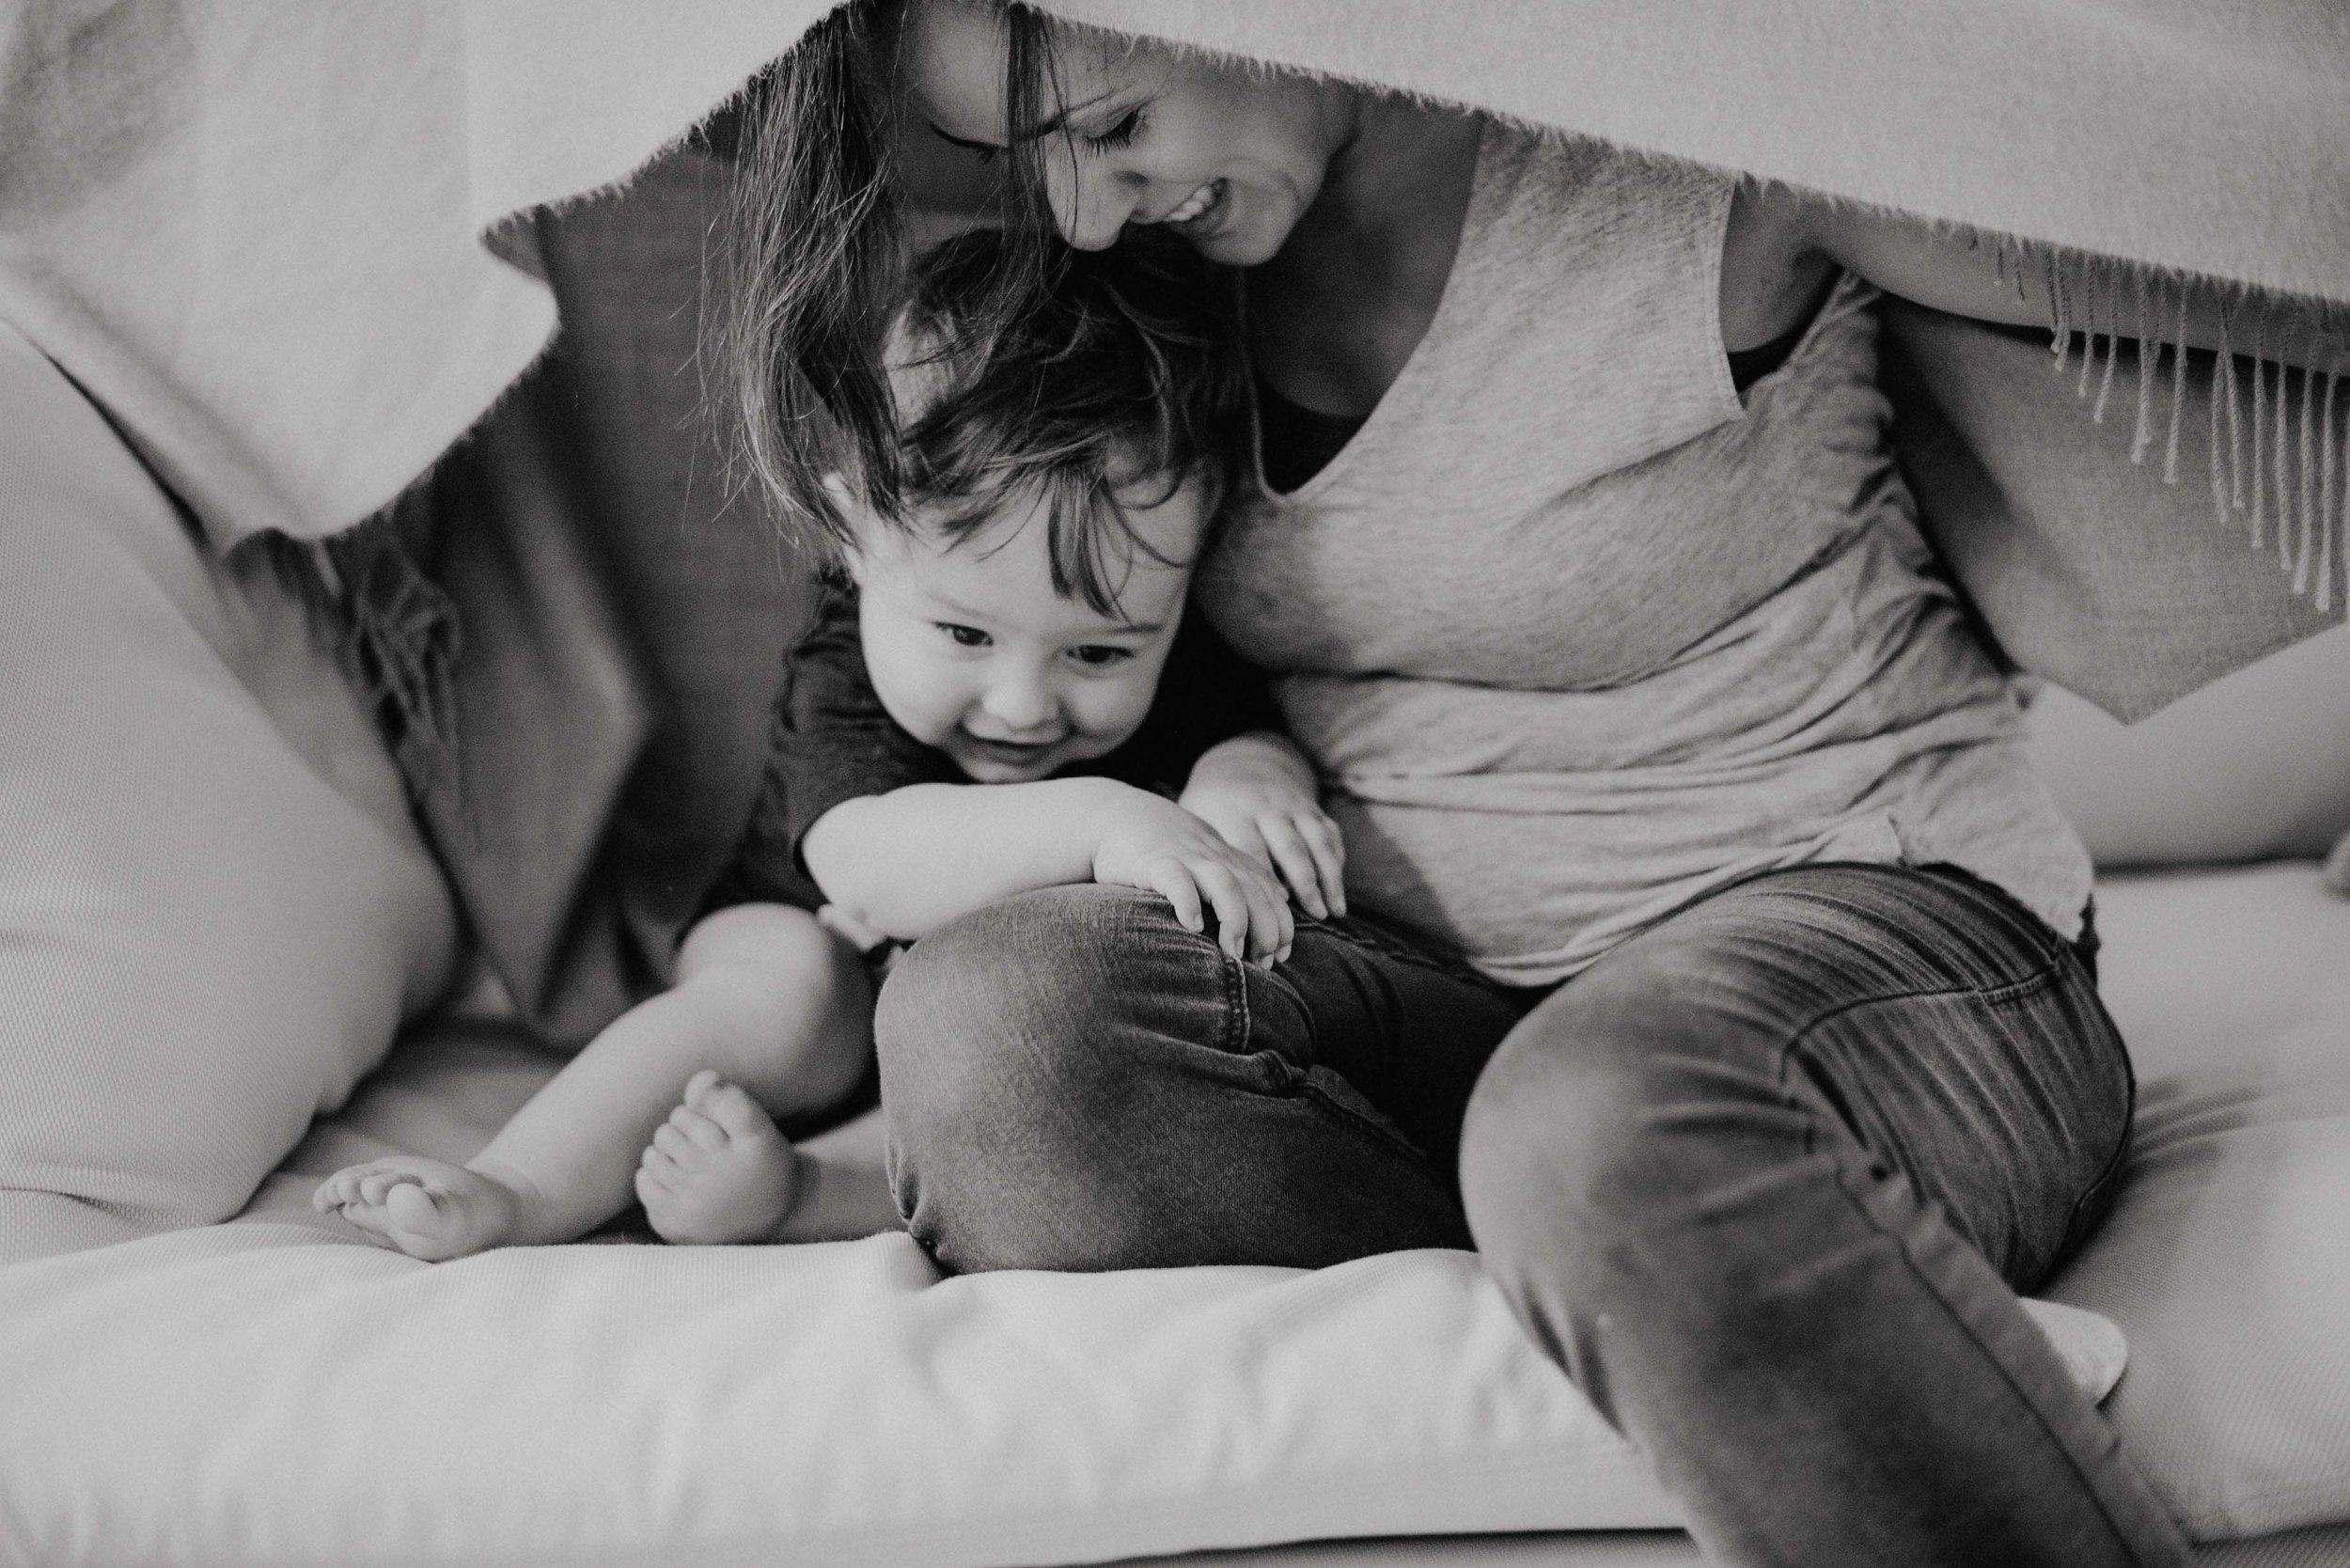 Babyshooting Familienfotografie Köln Bonn OH LUCY WEDDING_Finn und Kathi Babyshooting 16 Monate -9746.jpg